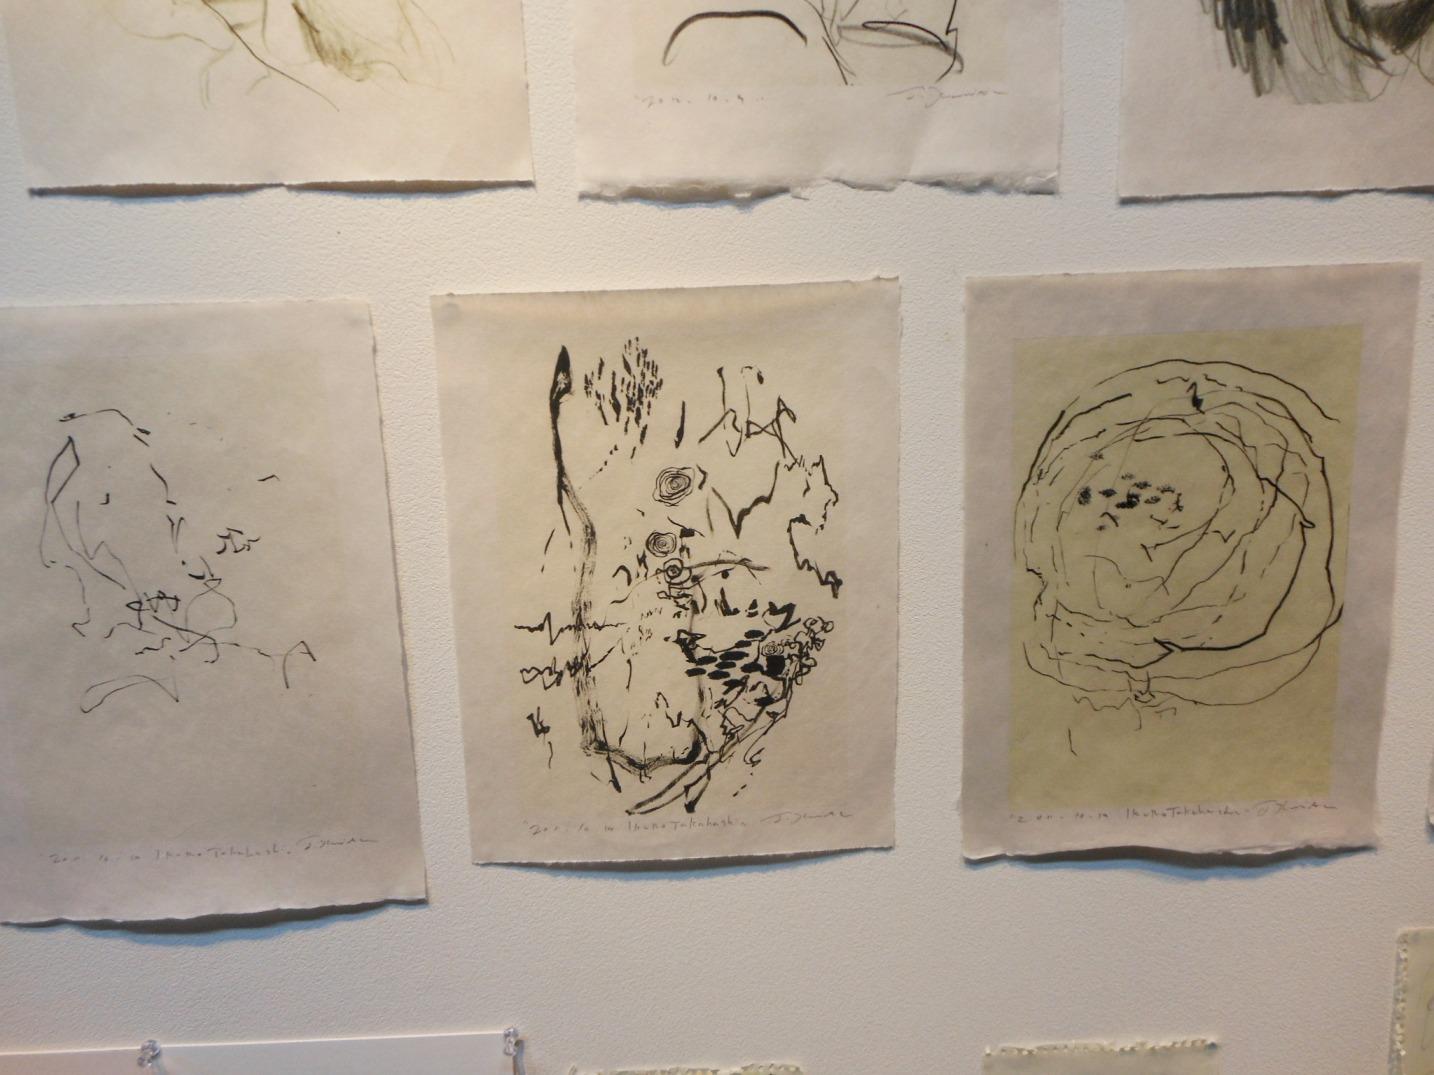 1650) 「栗田健・絵画展 『Portrait』」 af 終了・2月21日(火)~3月5日(月)_f0126829_2027121.jpg